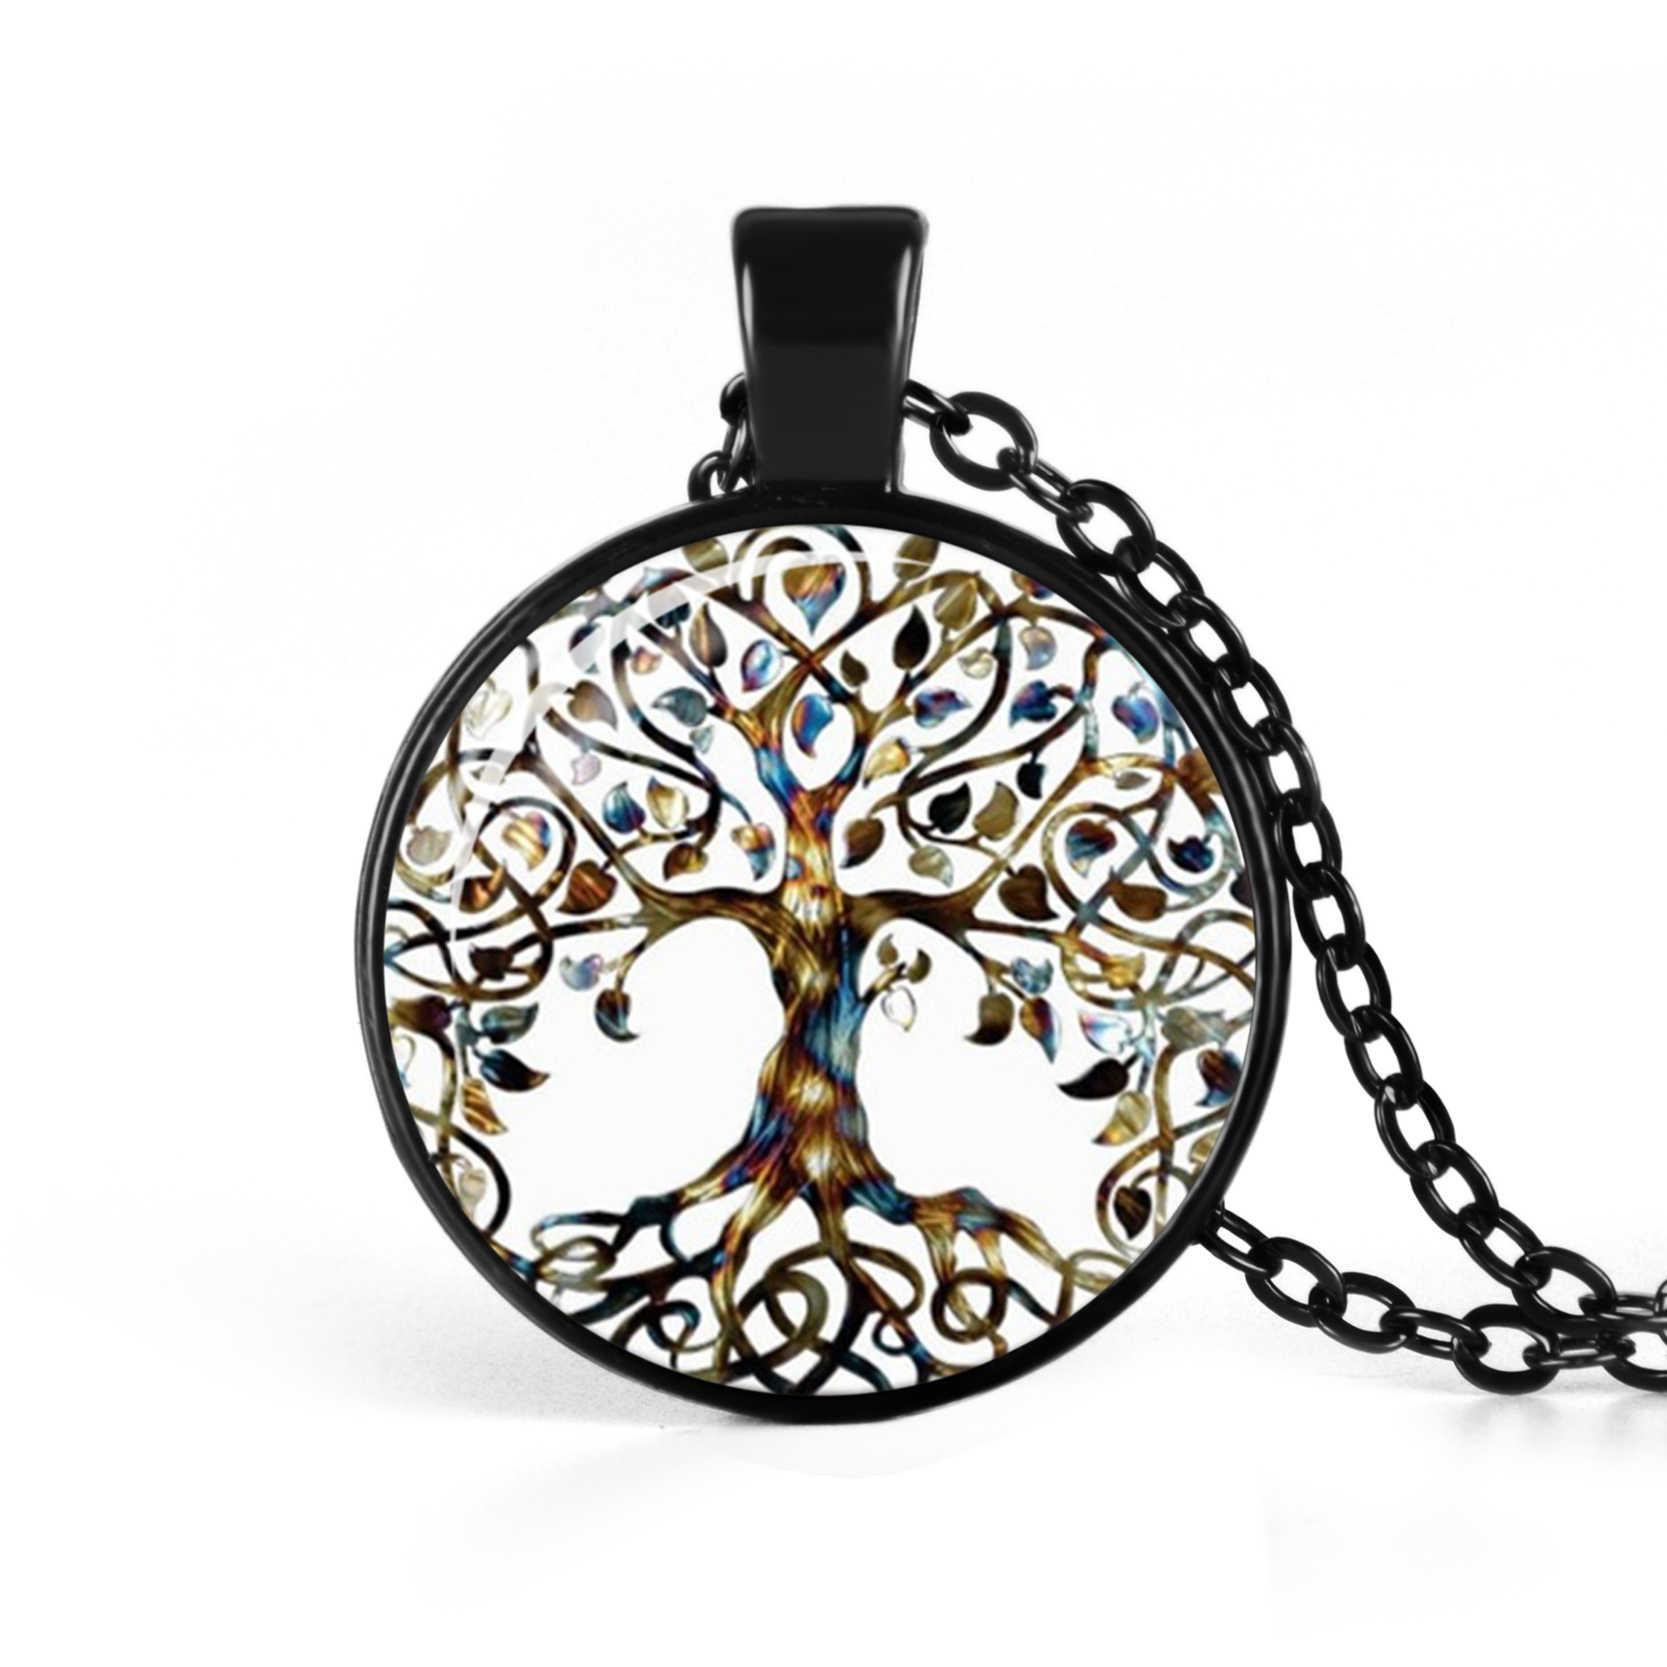 Life Tree จี้สร้อยคอแก้ว Cabochon สร้อยคอเงินสีดำ Bronze Vintage Choker สร้อยคอผู้หญิงเครื่องประดับ